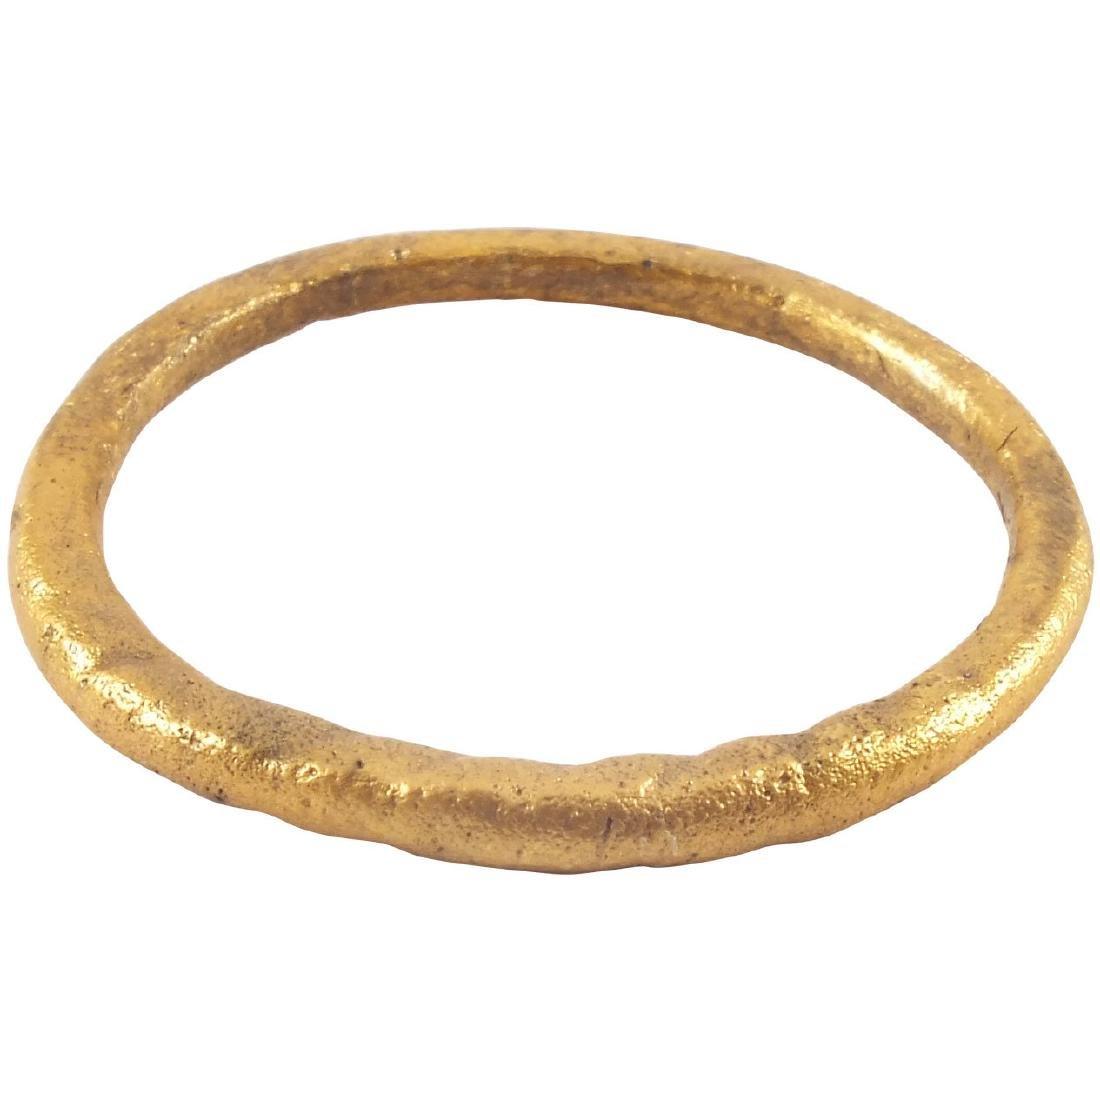 VIKING TWISTED MOTIF RING 850-1050 AD